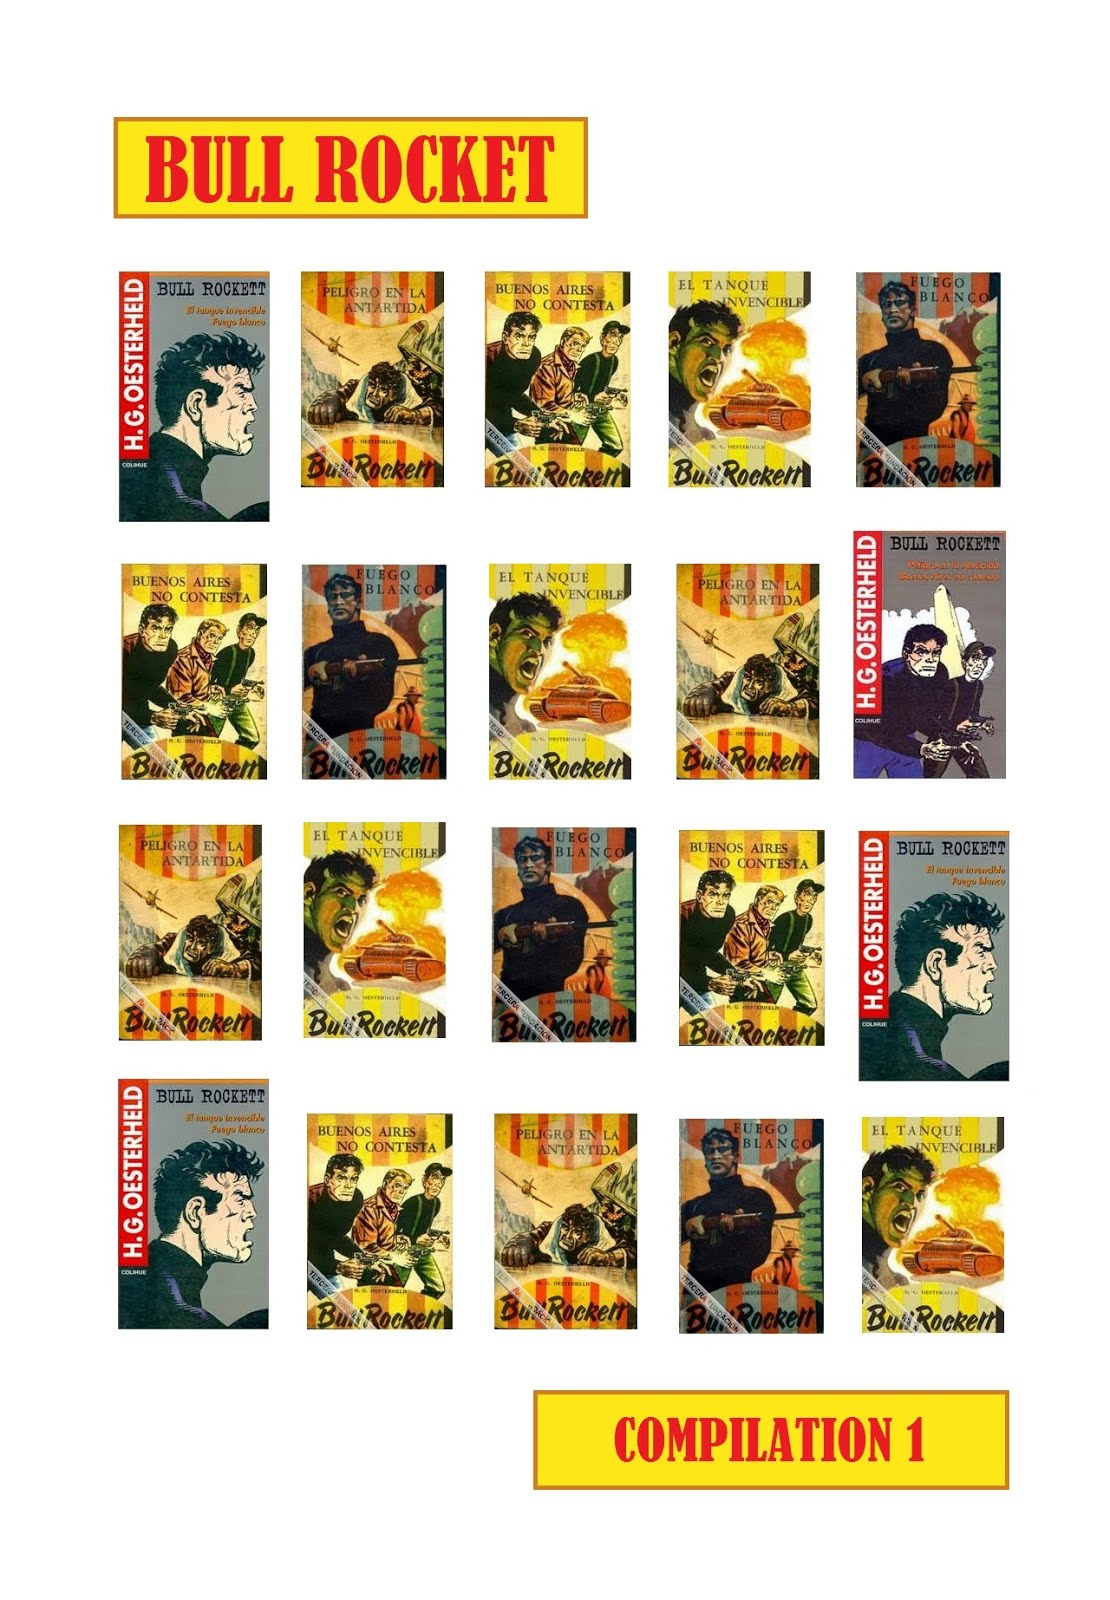 BULL ROCKET dans BLEK (1963-1964) - Compilation de JAWAD